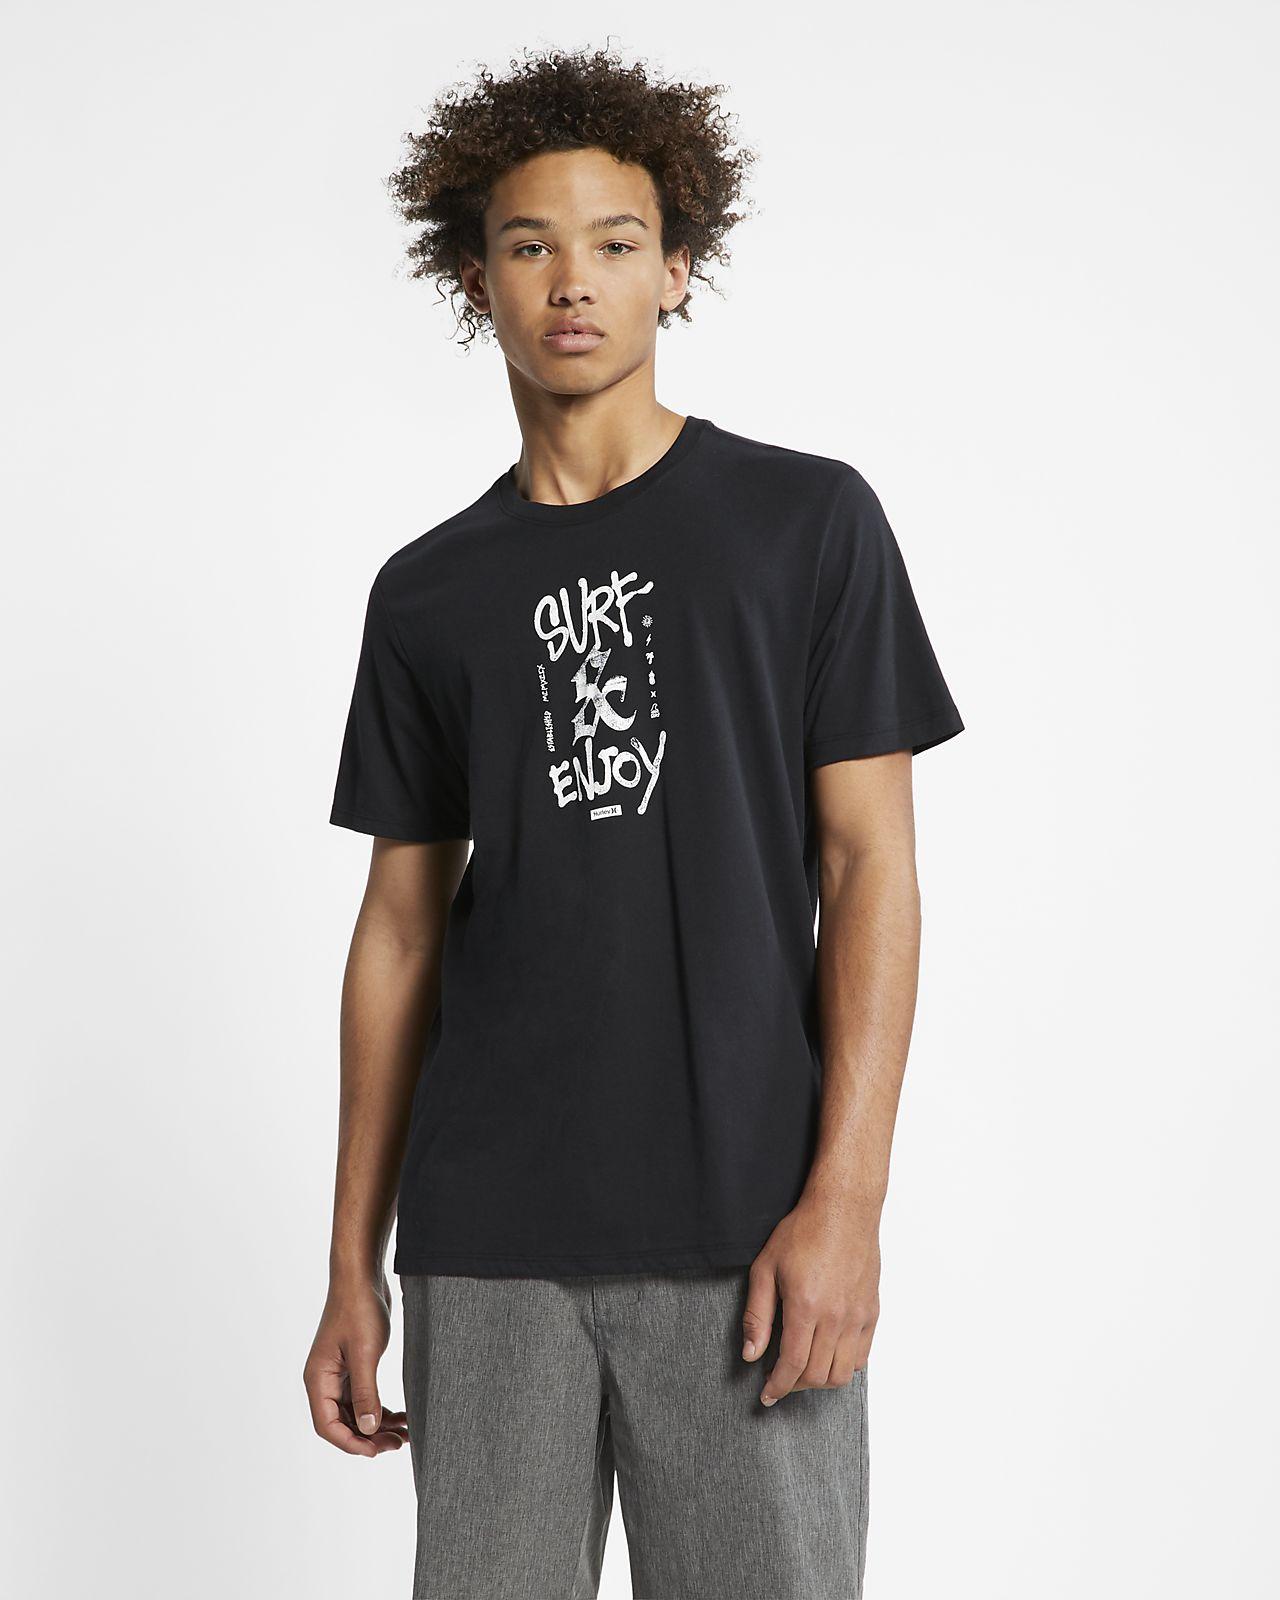 Hurley Dri-FIT Surf And Enjoy Men's T-Shirt